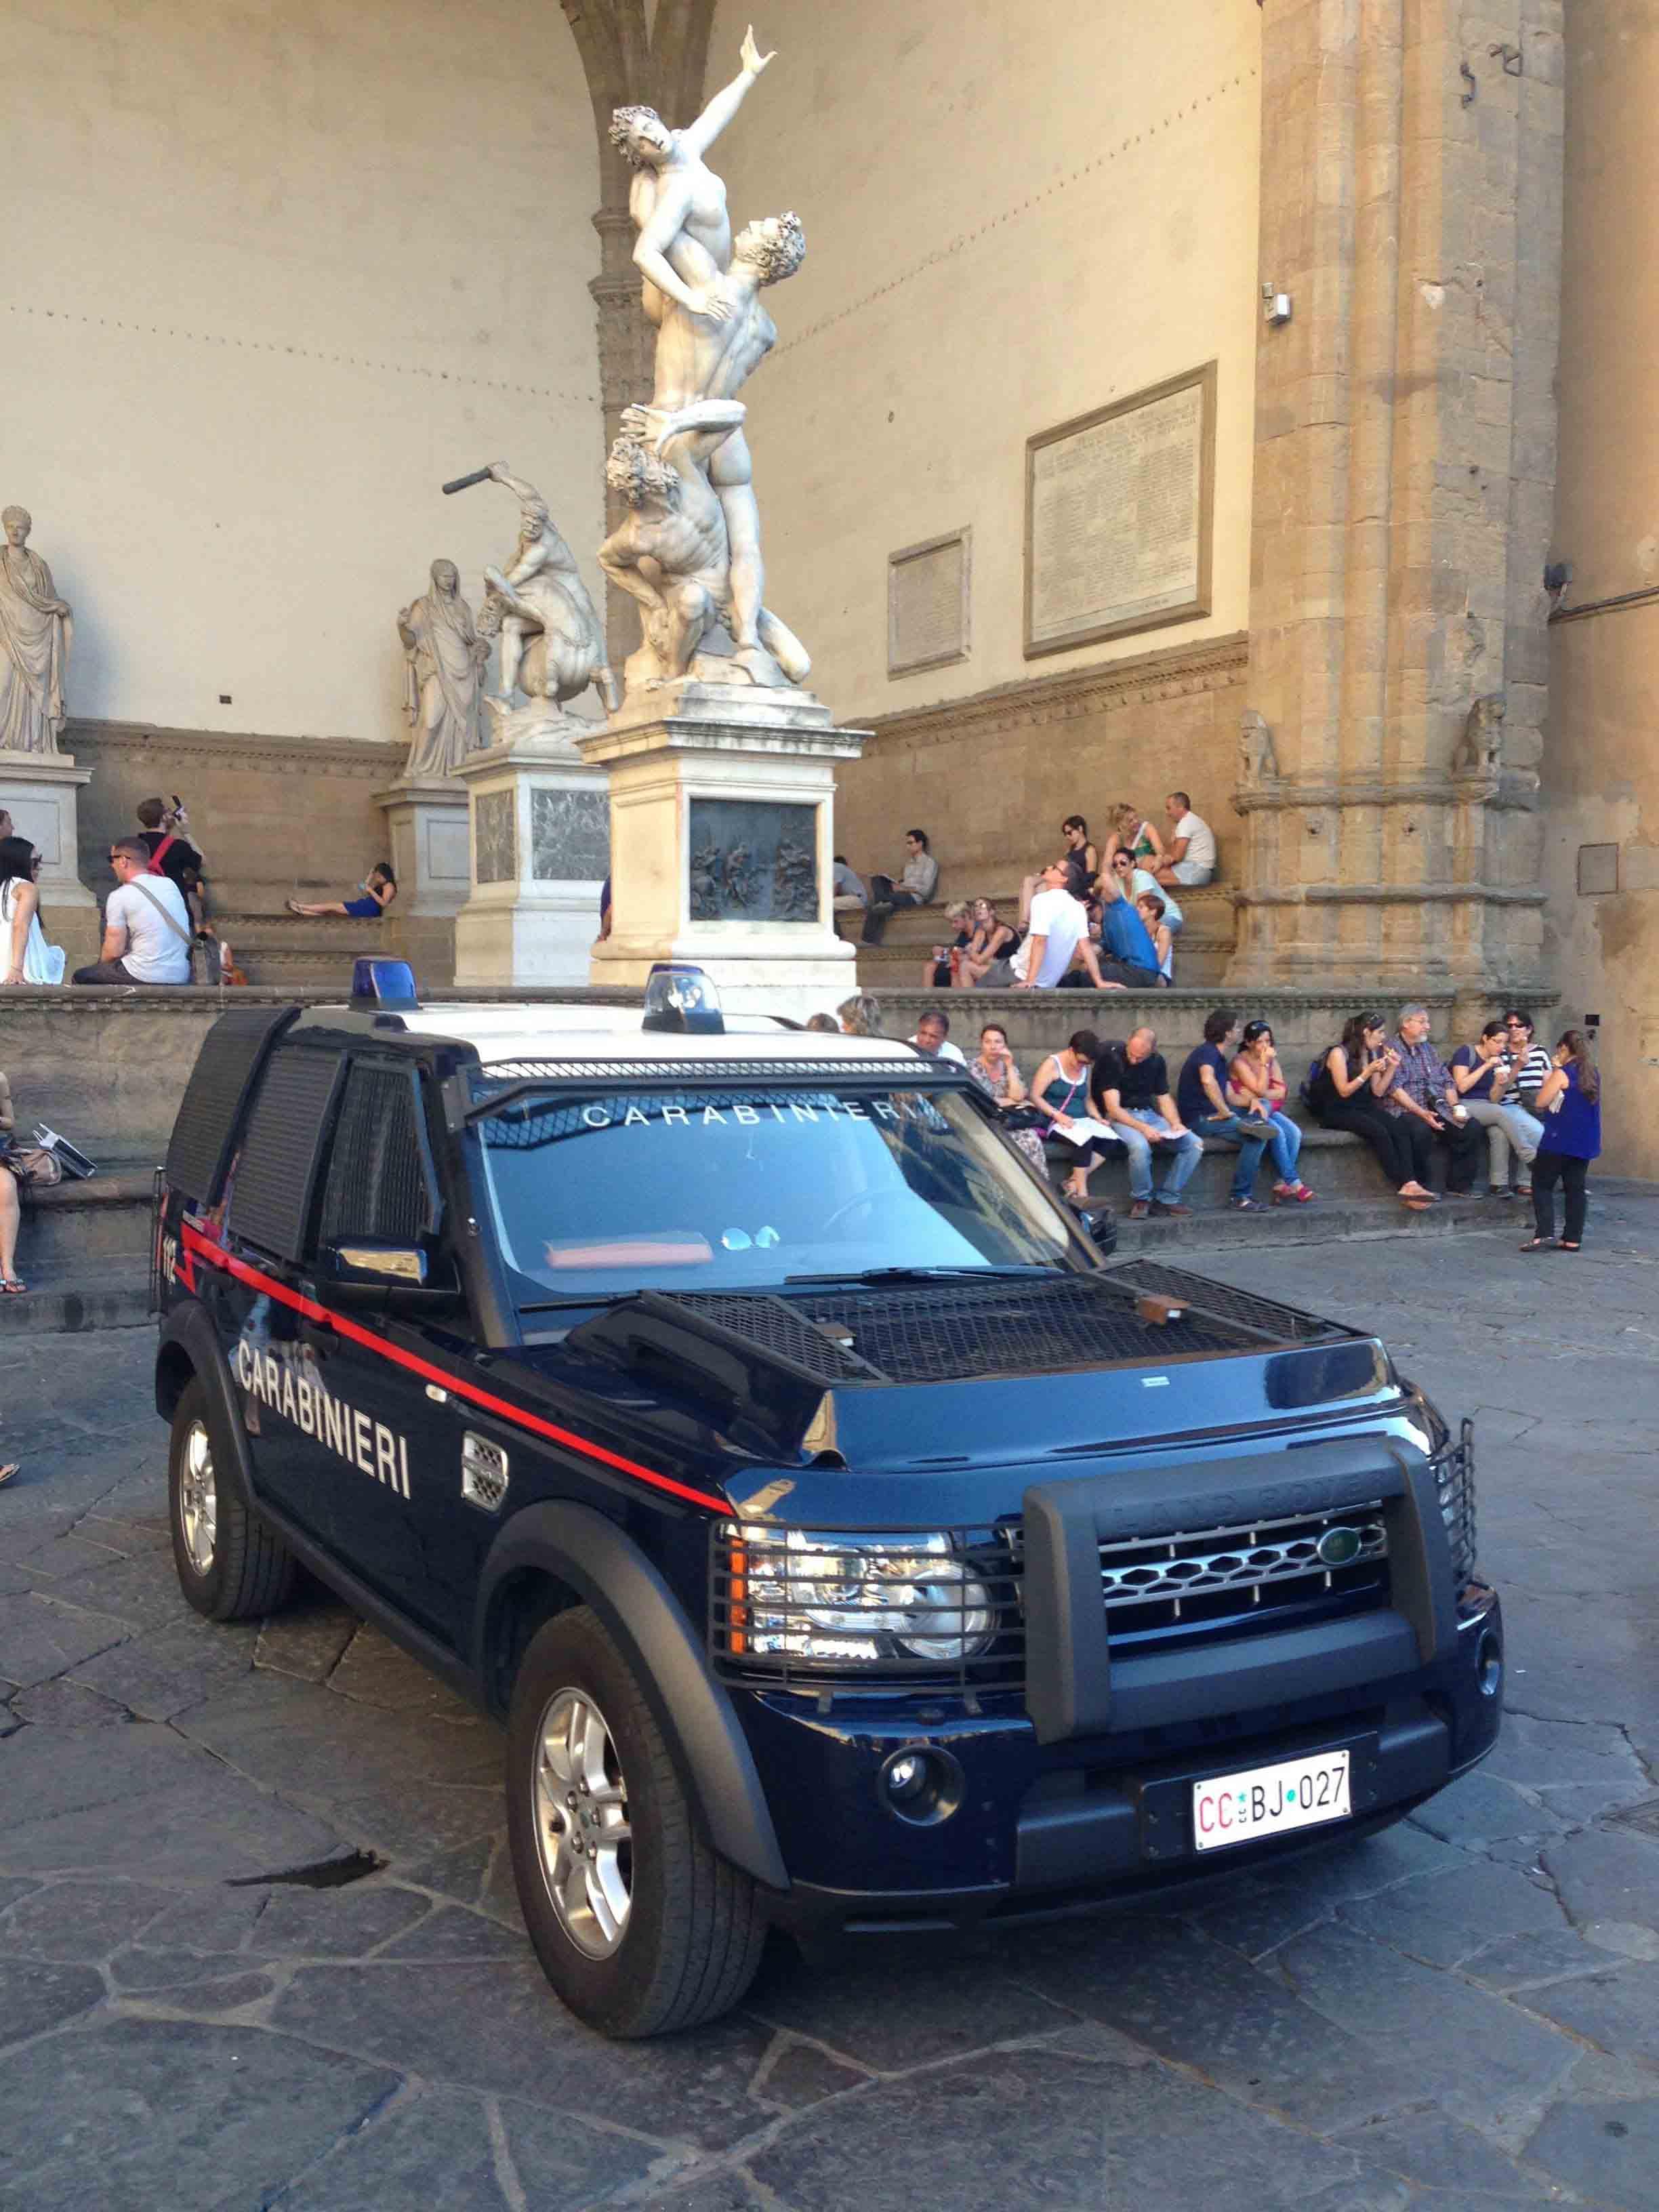 Land Rover Discovery in Piazza della Signoria, Florence, Italy